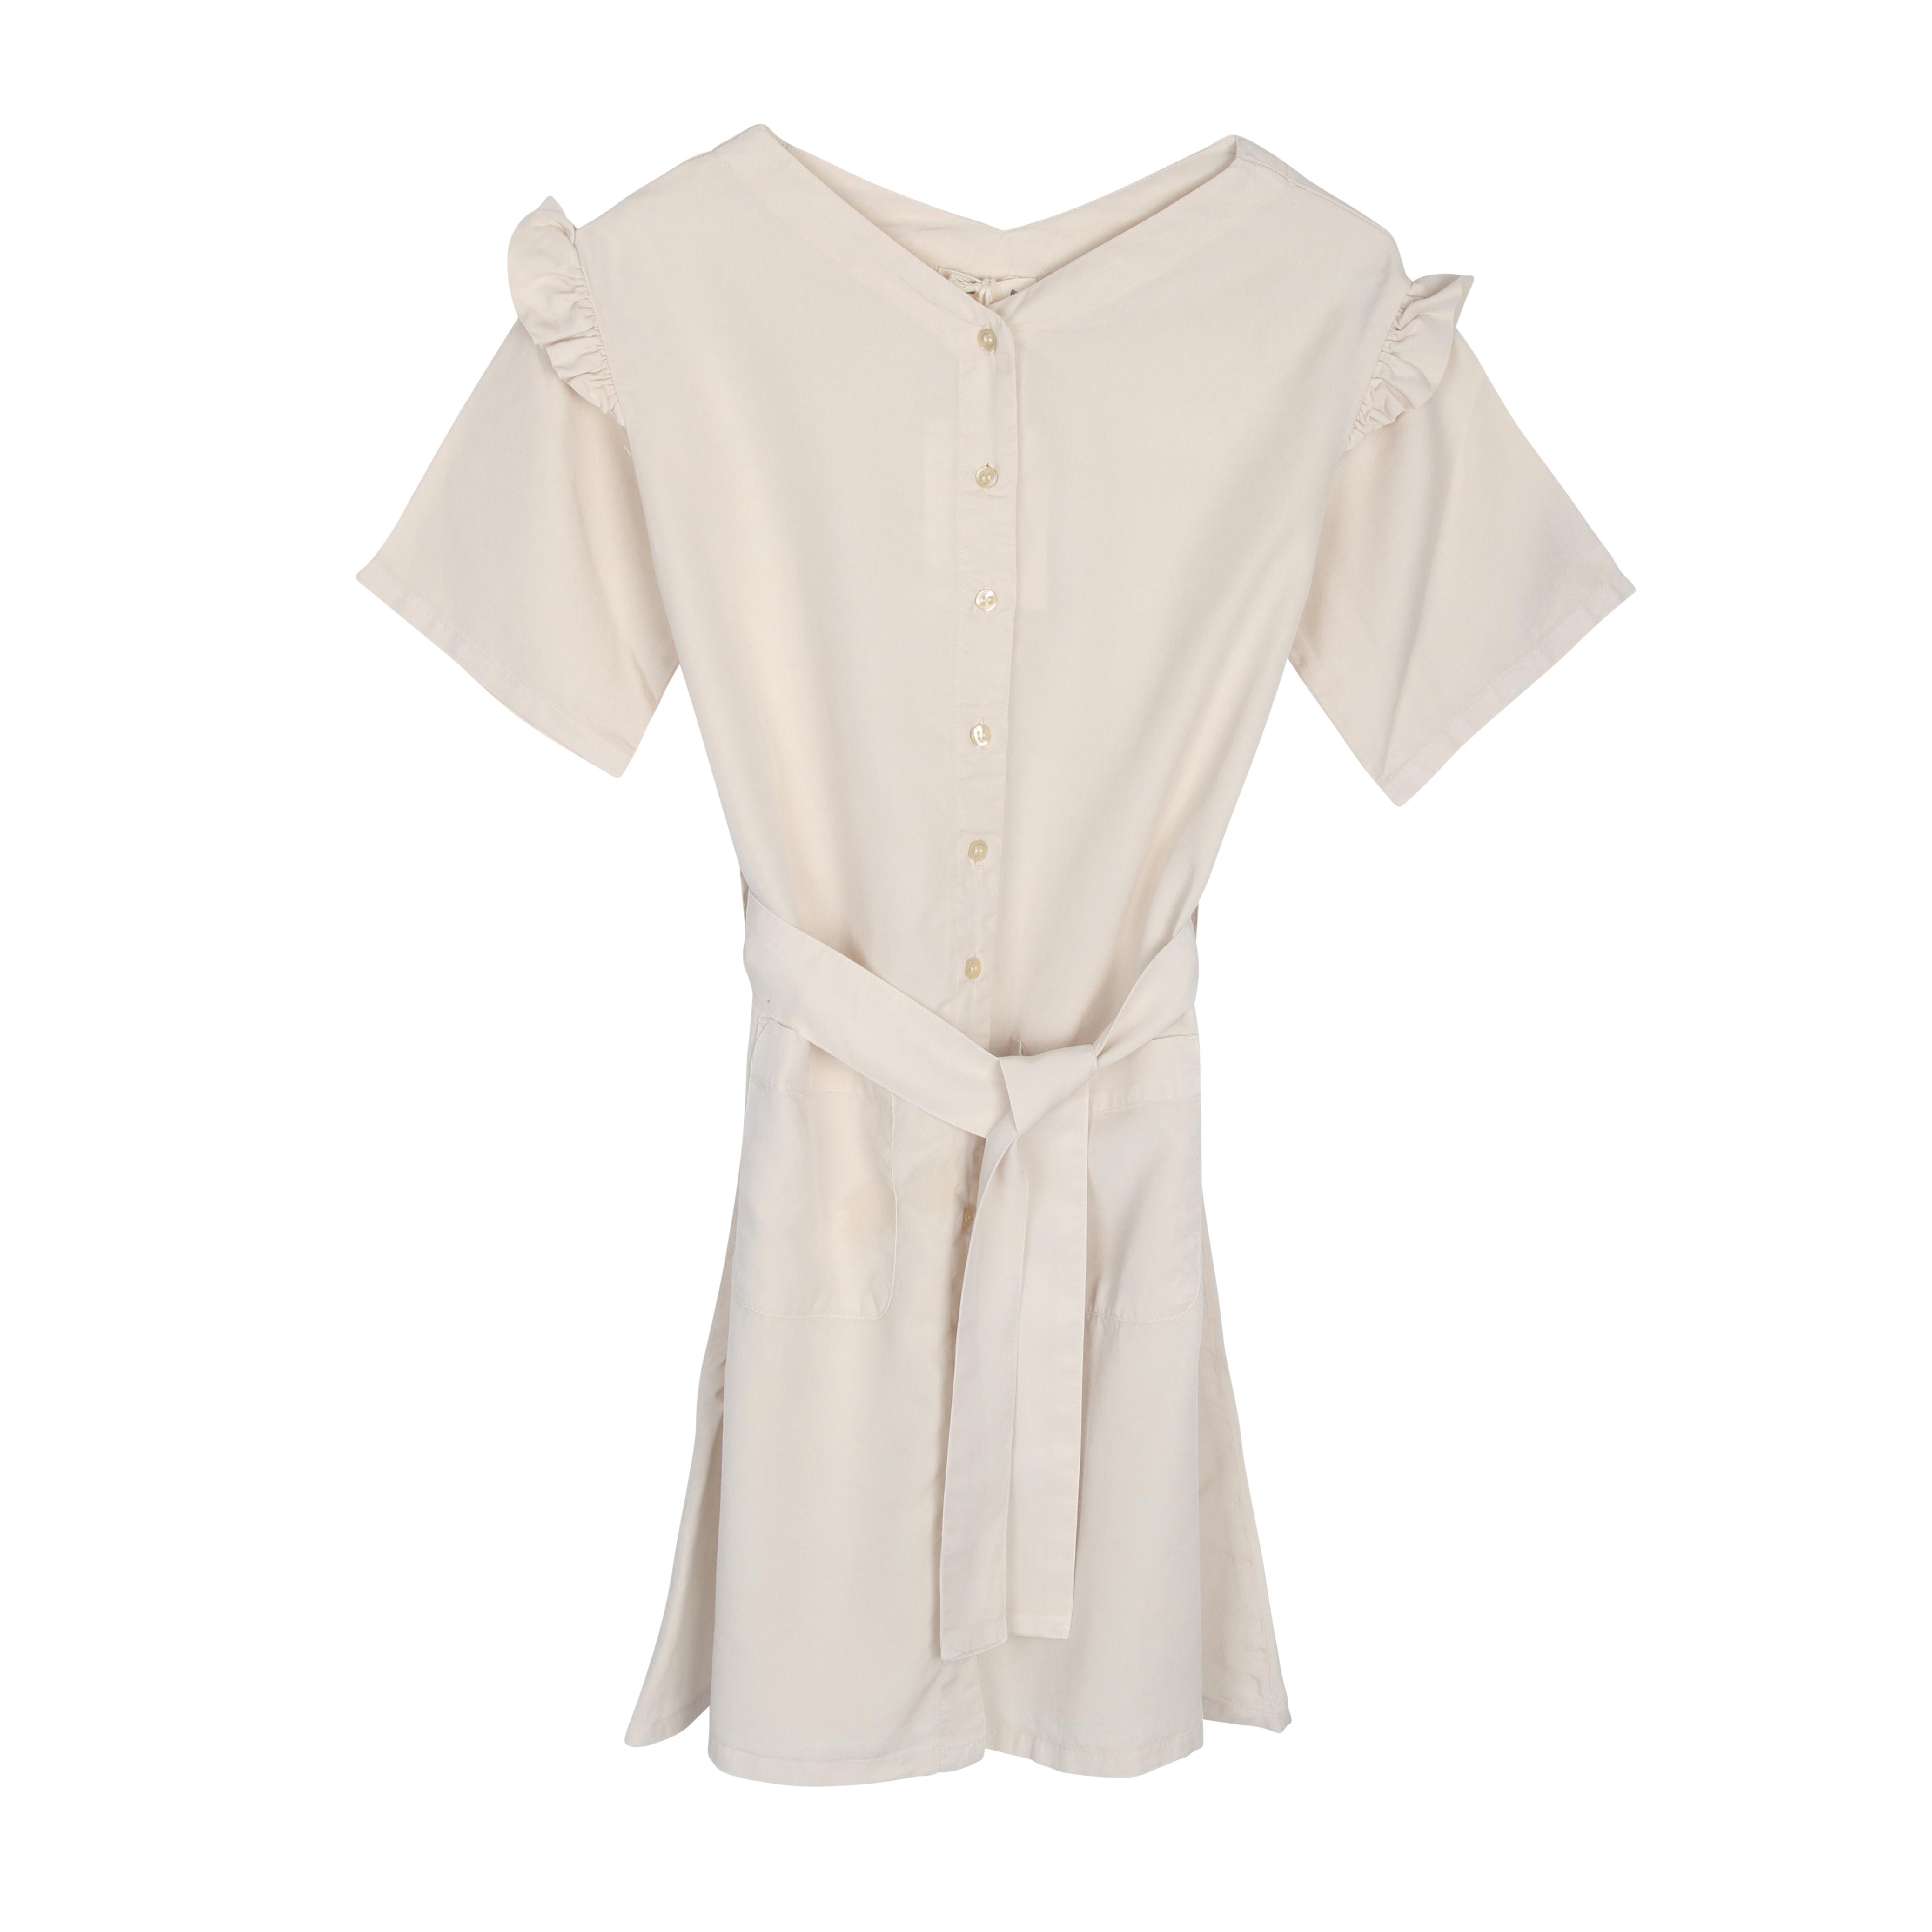 THE BIBIO PROJECT TIE DRESS(WHITE SWAN)